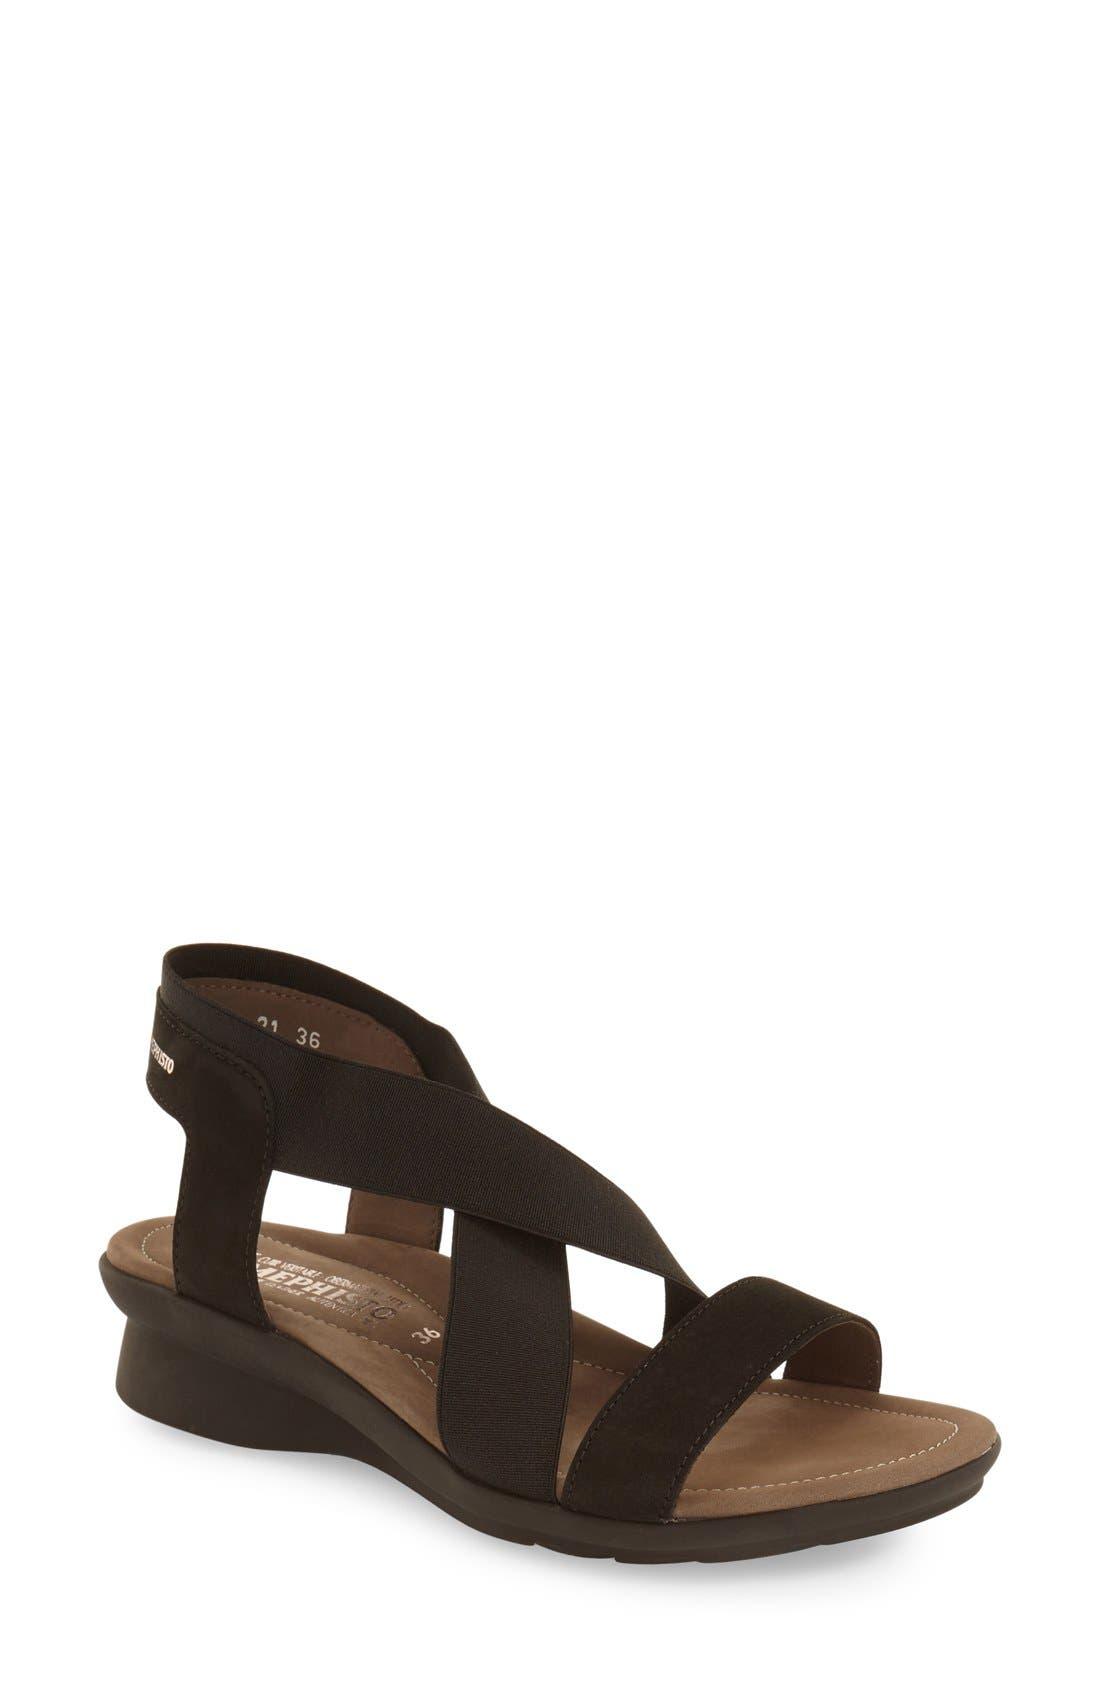 MEPHISTO 'Pastora' Sandal, Main, color, BLACK BUCKSOFT